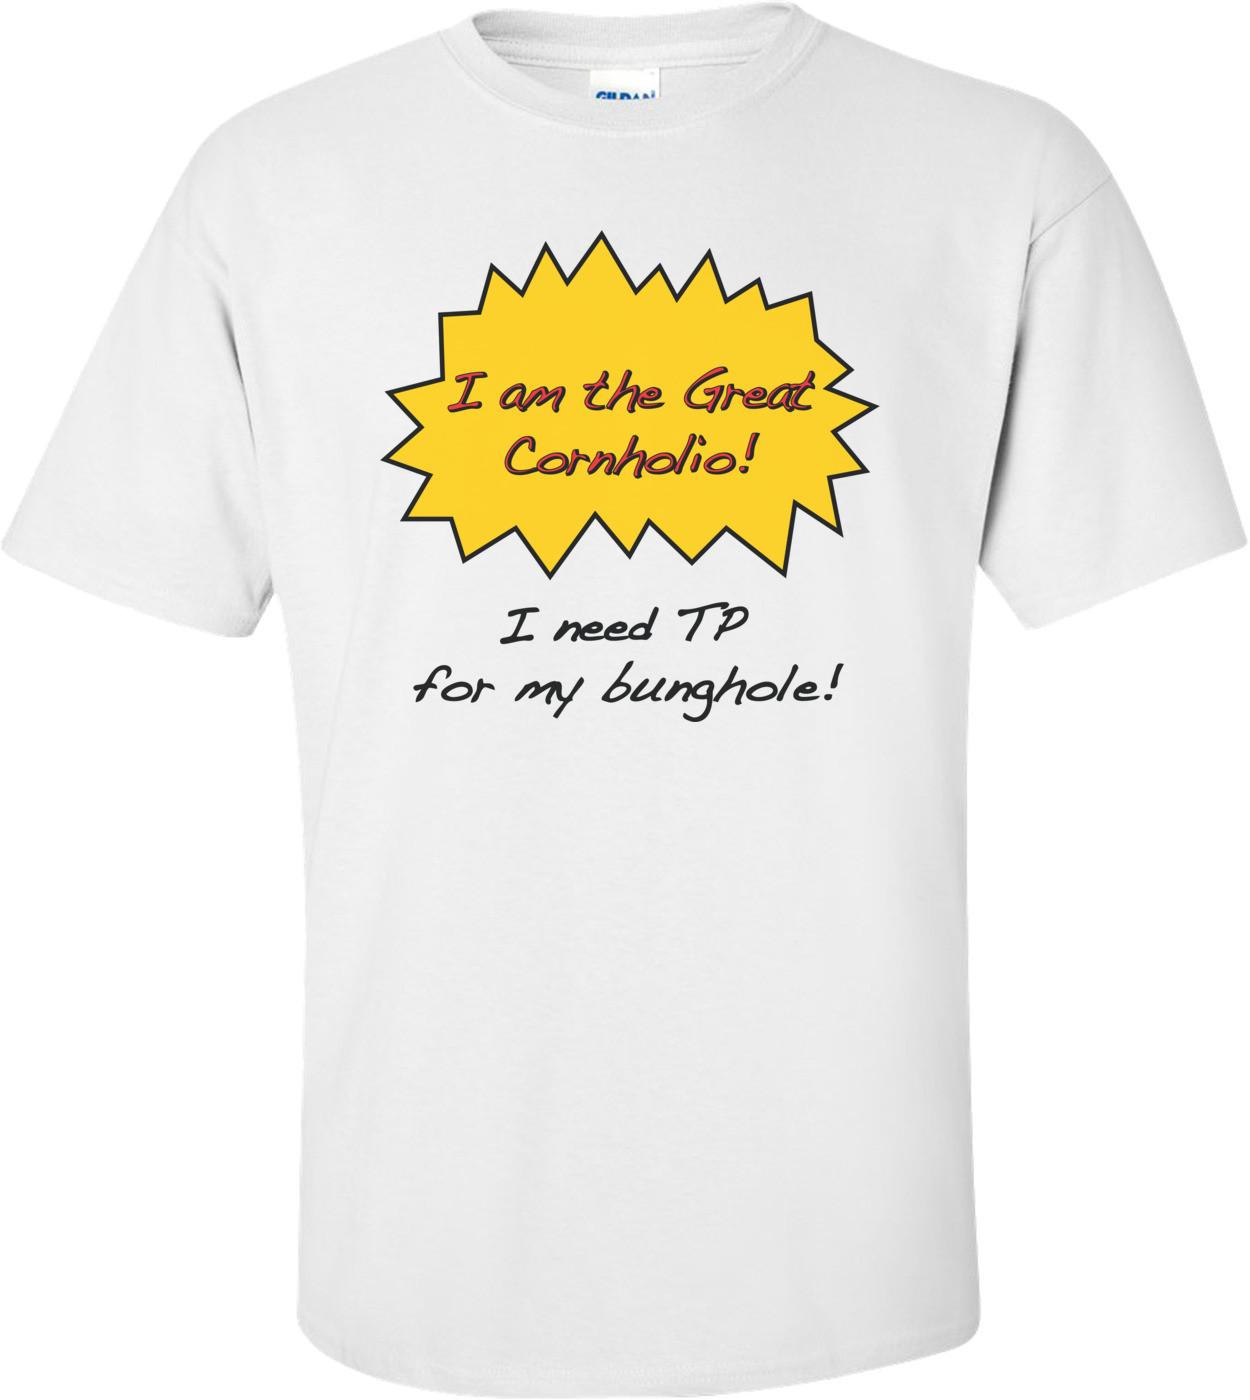 Beavis And Butthead Cornholio T-shirt